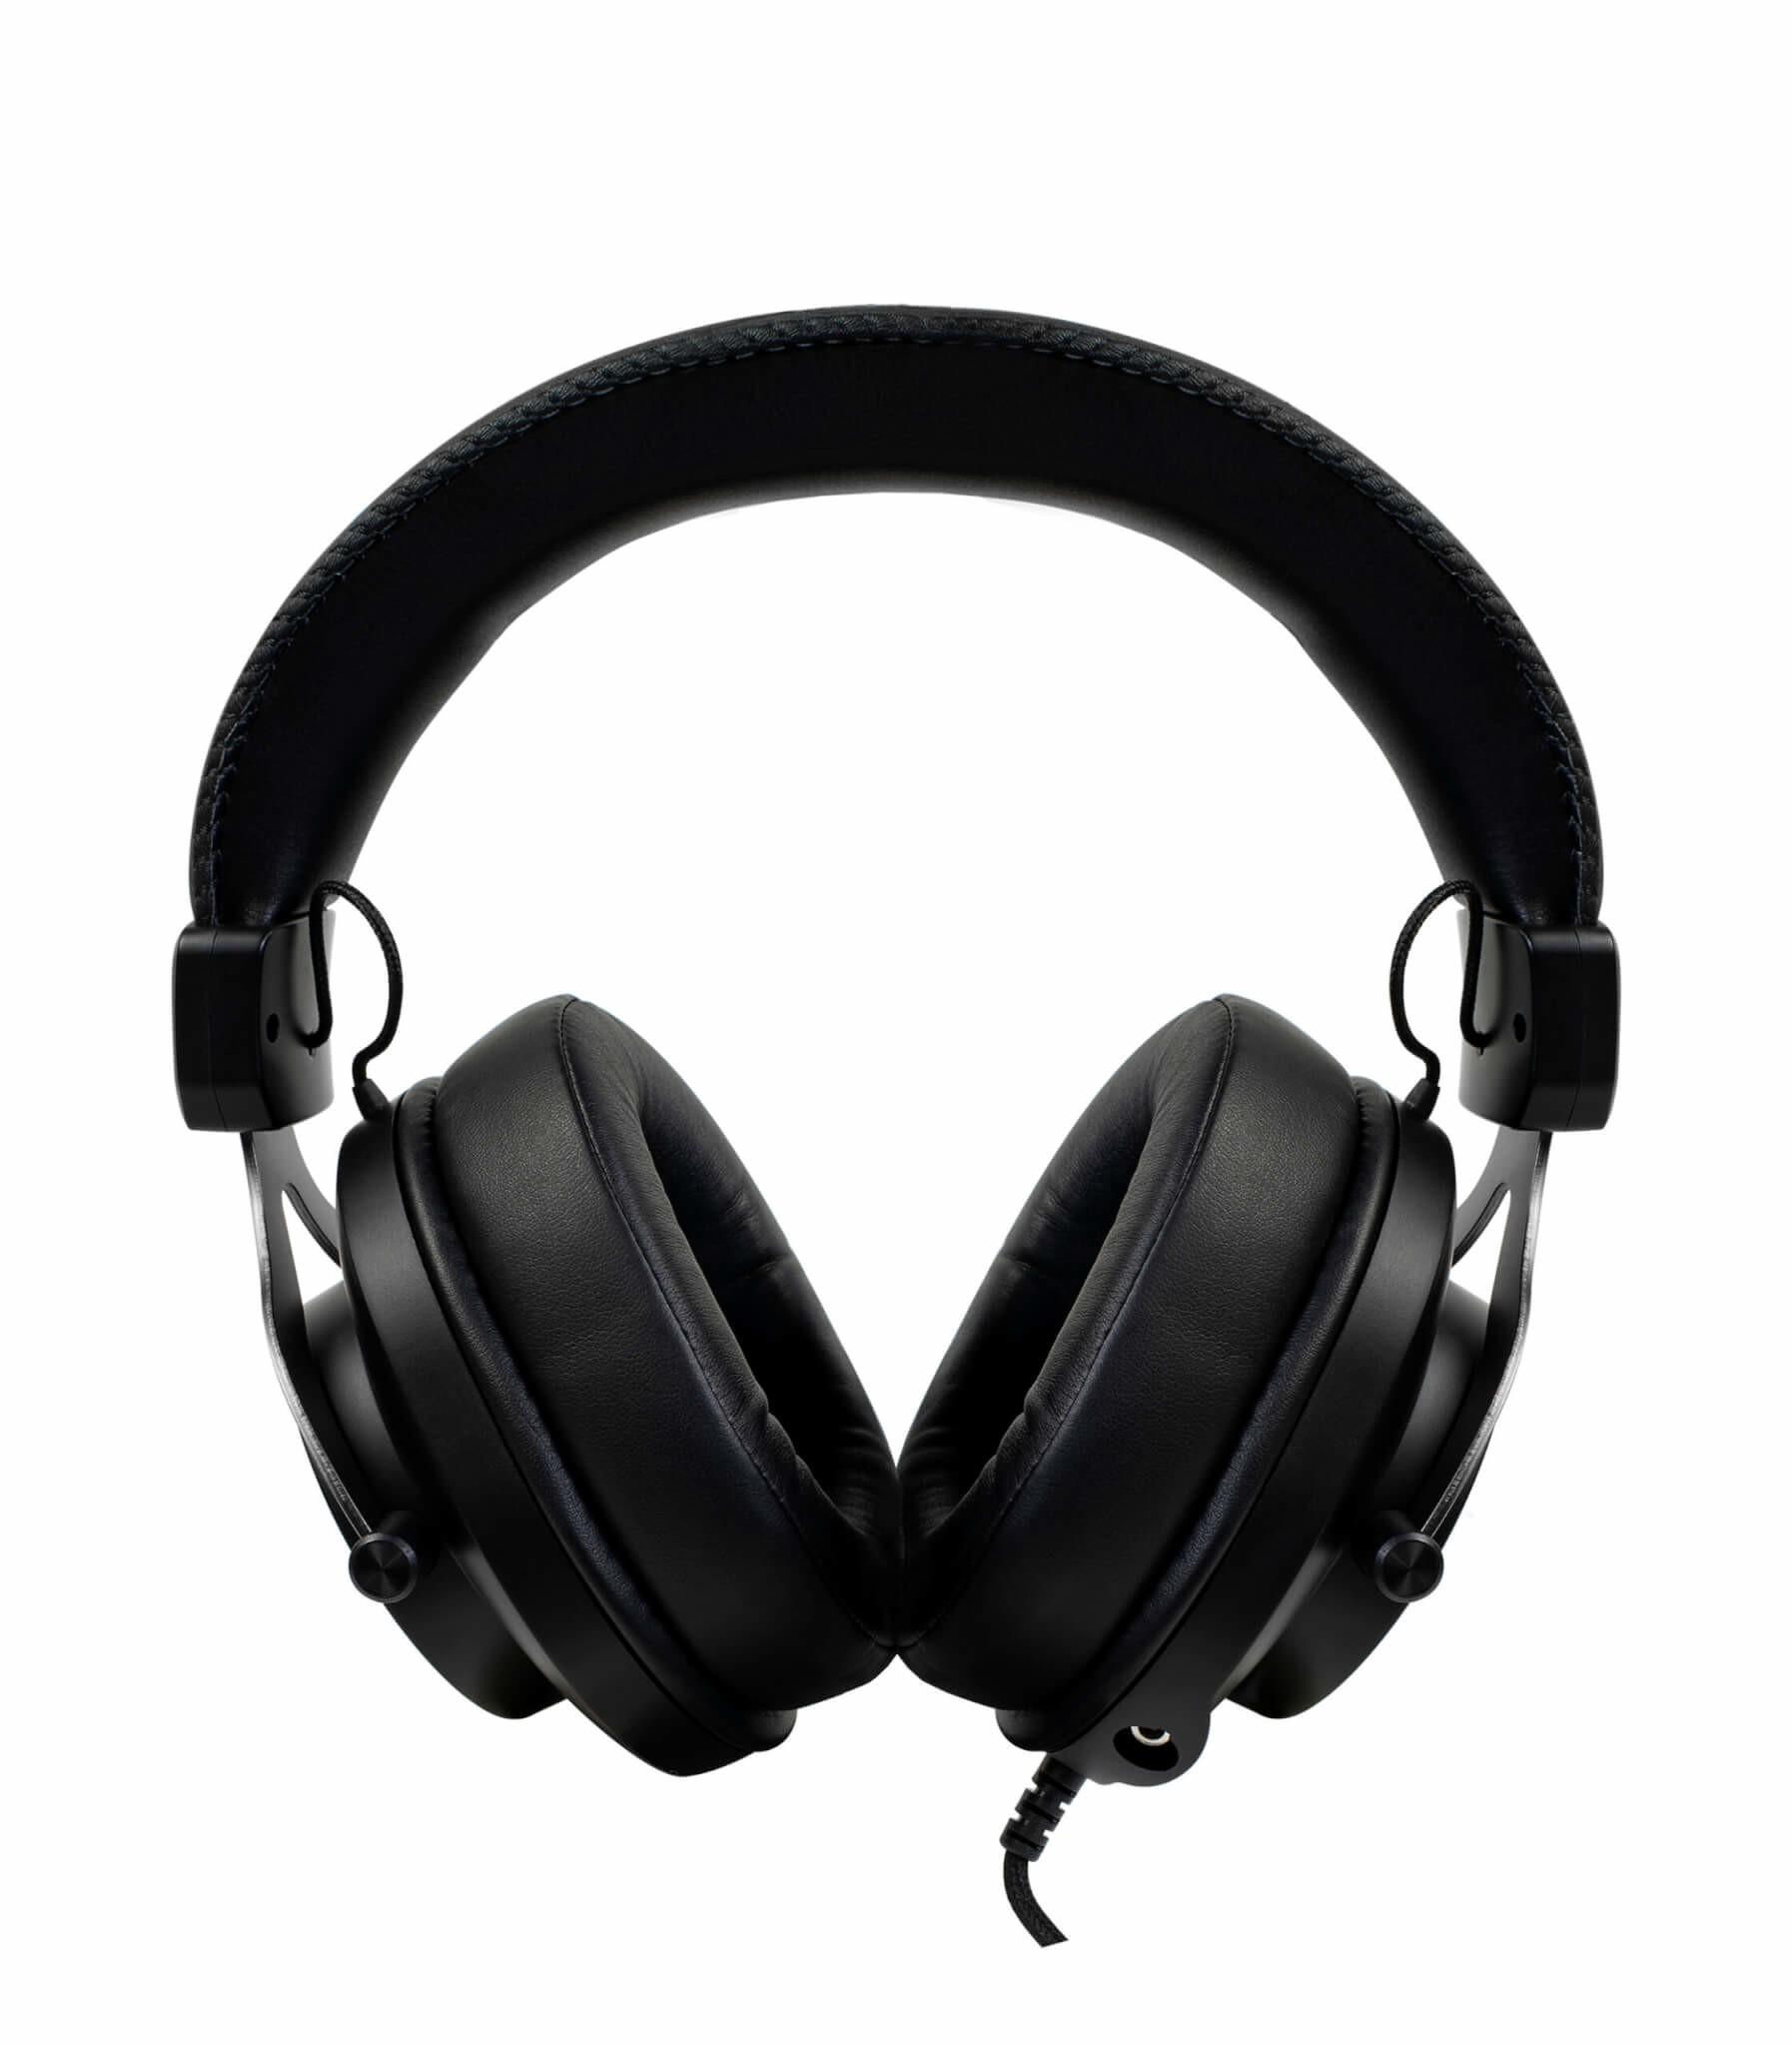 Arozzi Aria Headset Hoofdband Zwart 3,5mm-connector